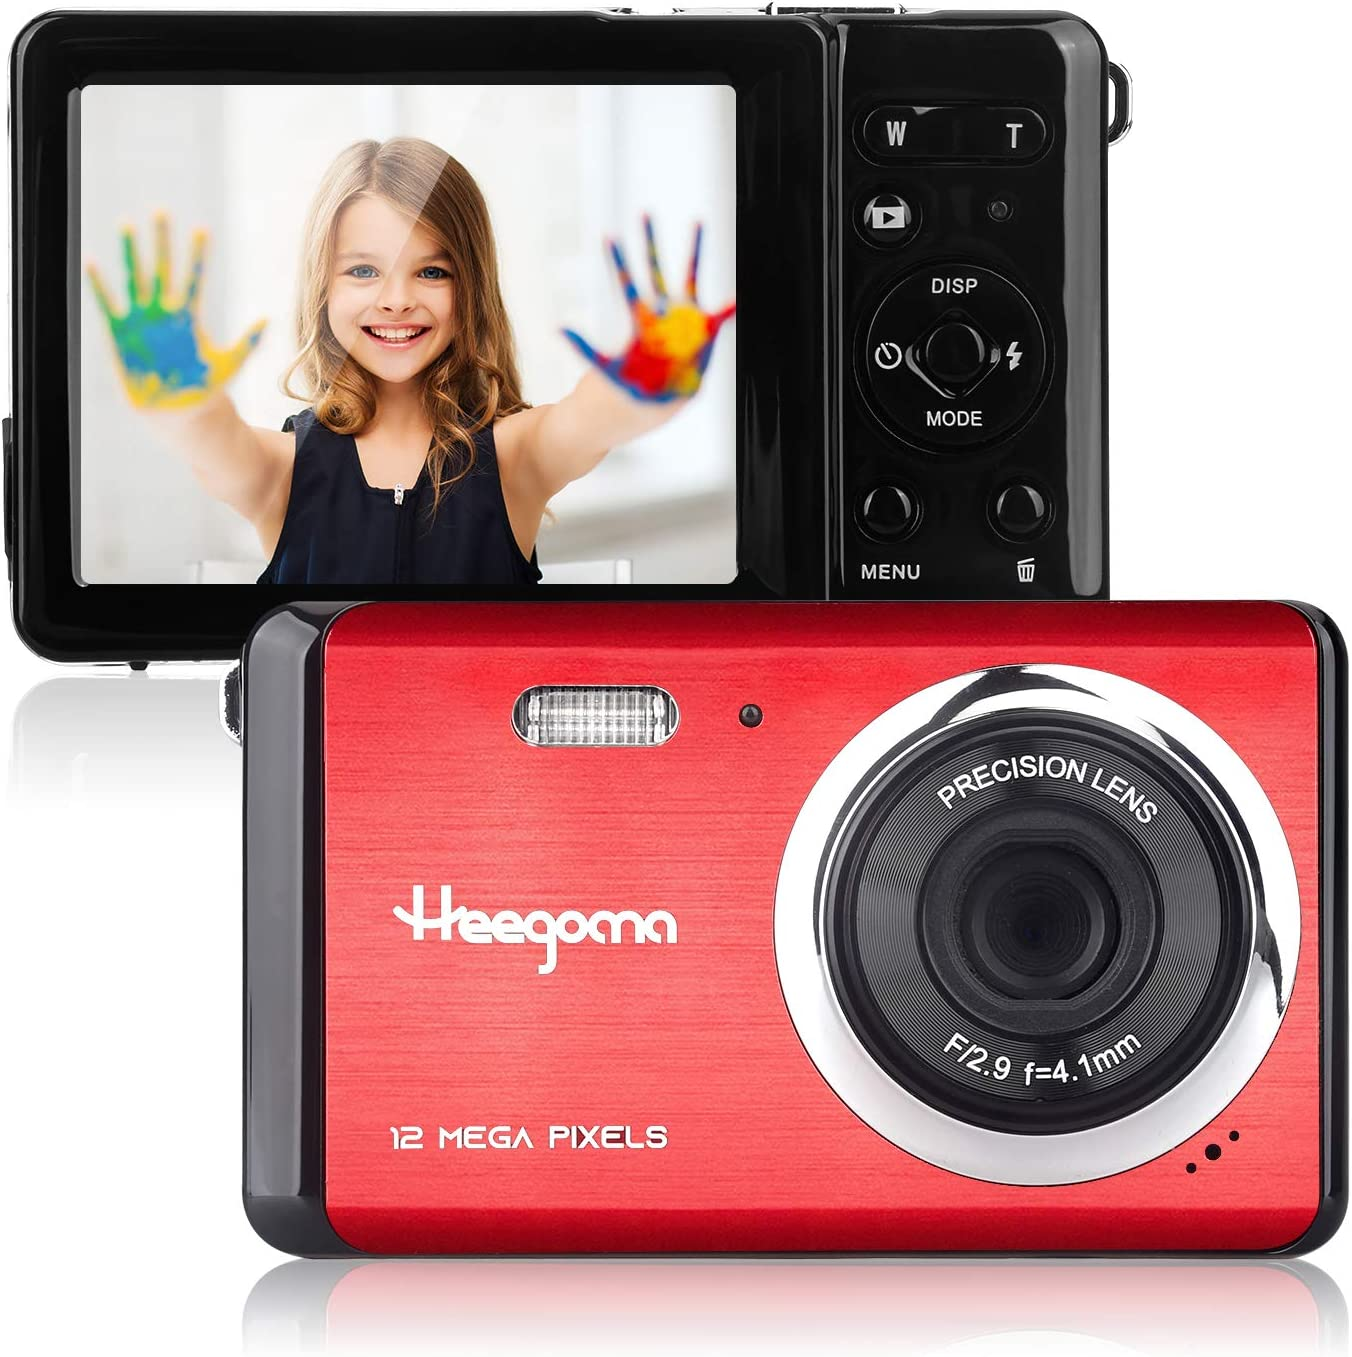 Mini Digital Camera, Heegomn 2.8 Inch Screen 8X Digital Zoom 12MP Rechargeable Digital Camera for Kids, Lightweight Pocket Camera Beginner Camera Point and Shoot Digital Camera